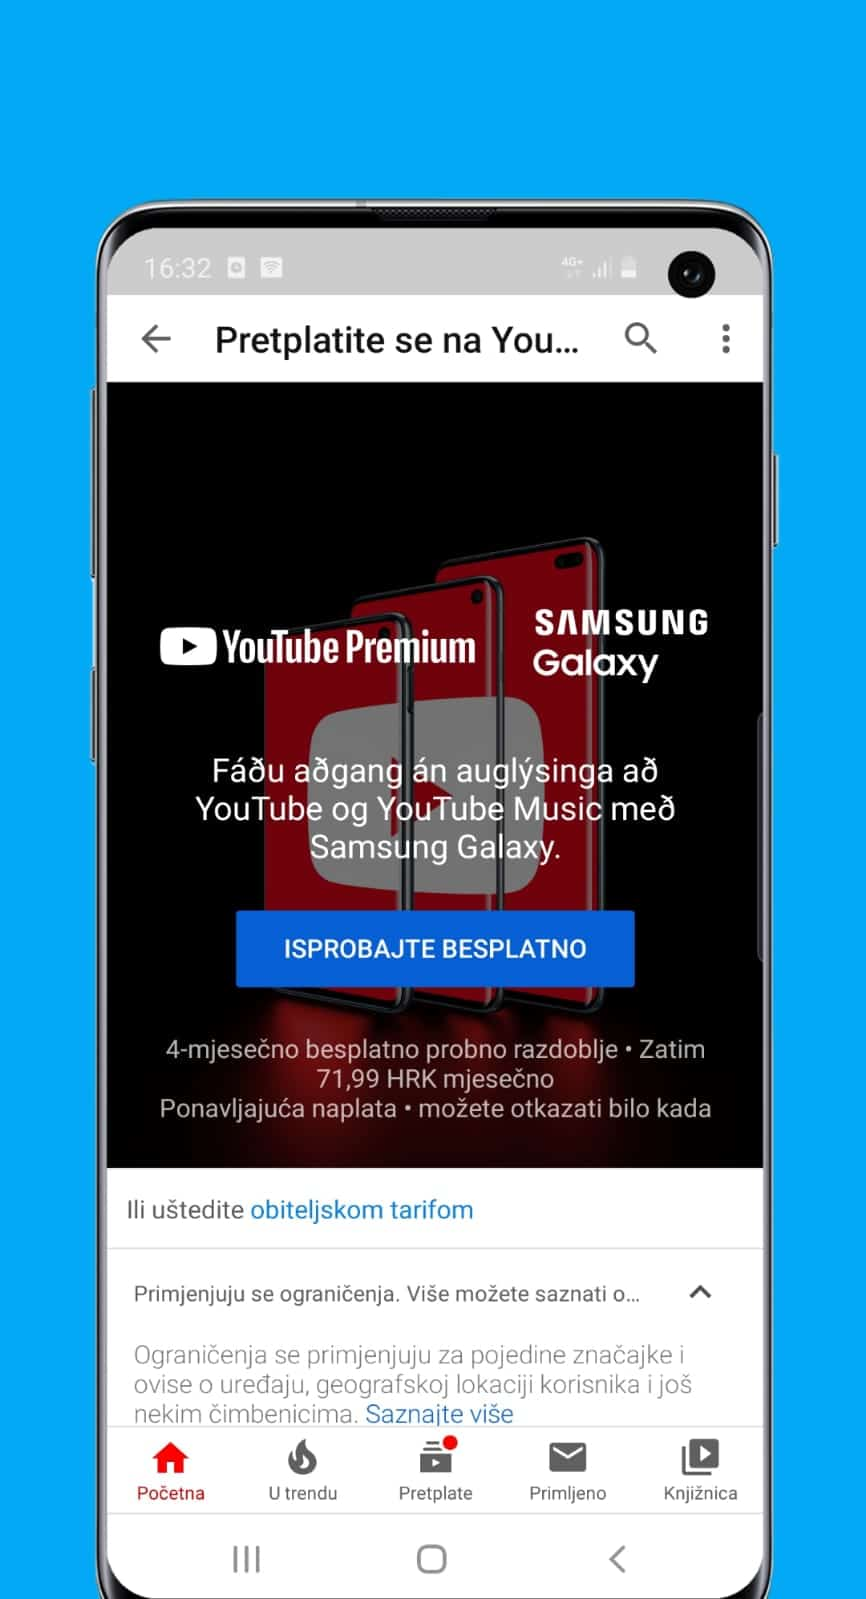 kako prestati objavljivati oglase na youtube-u